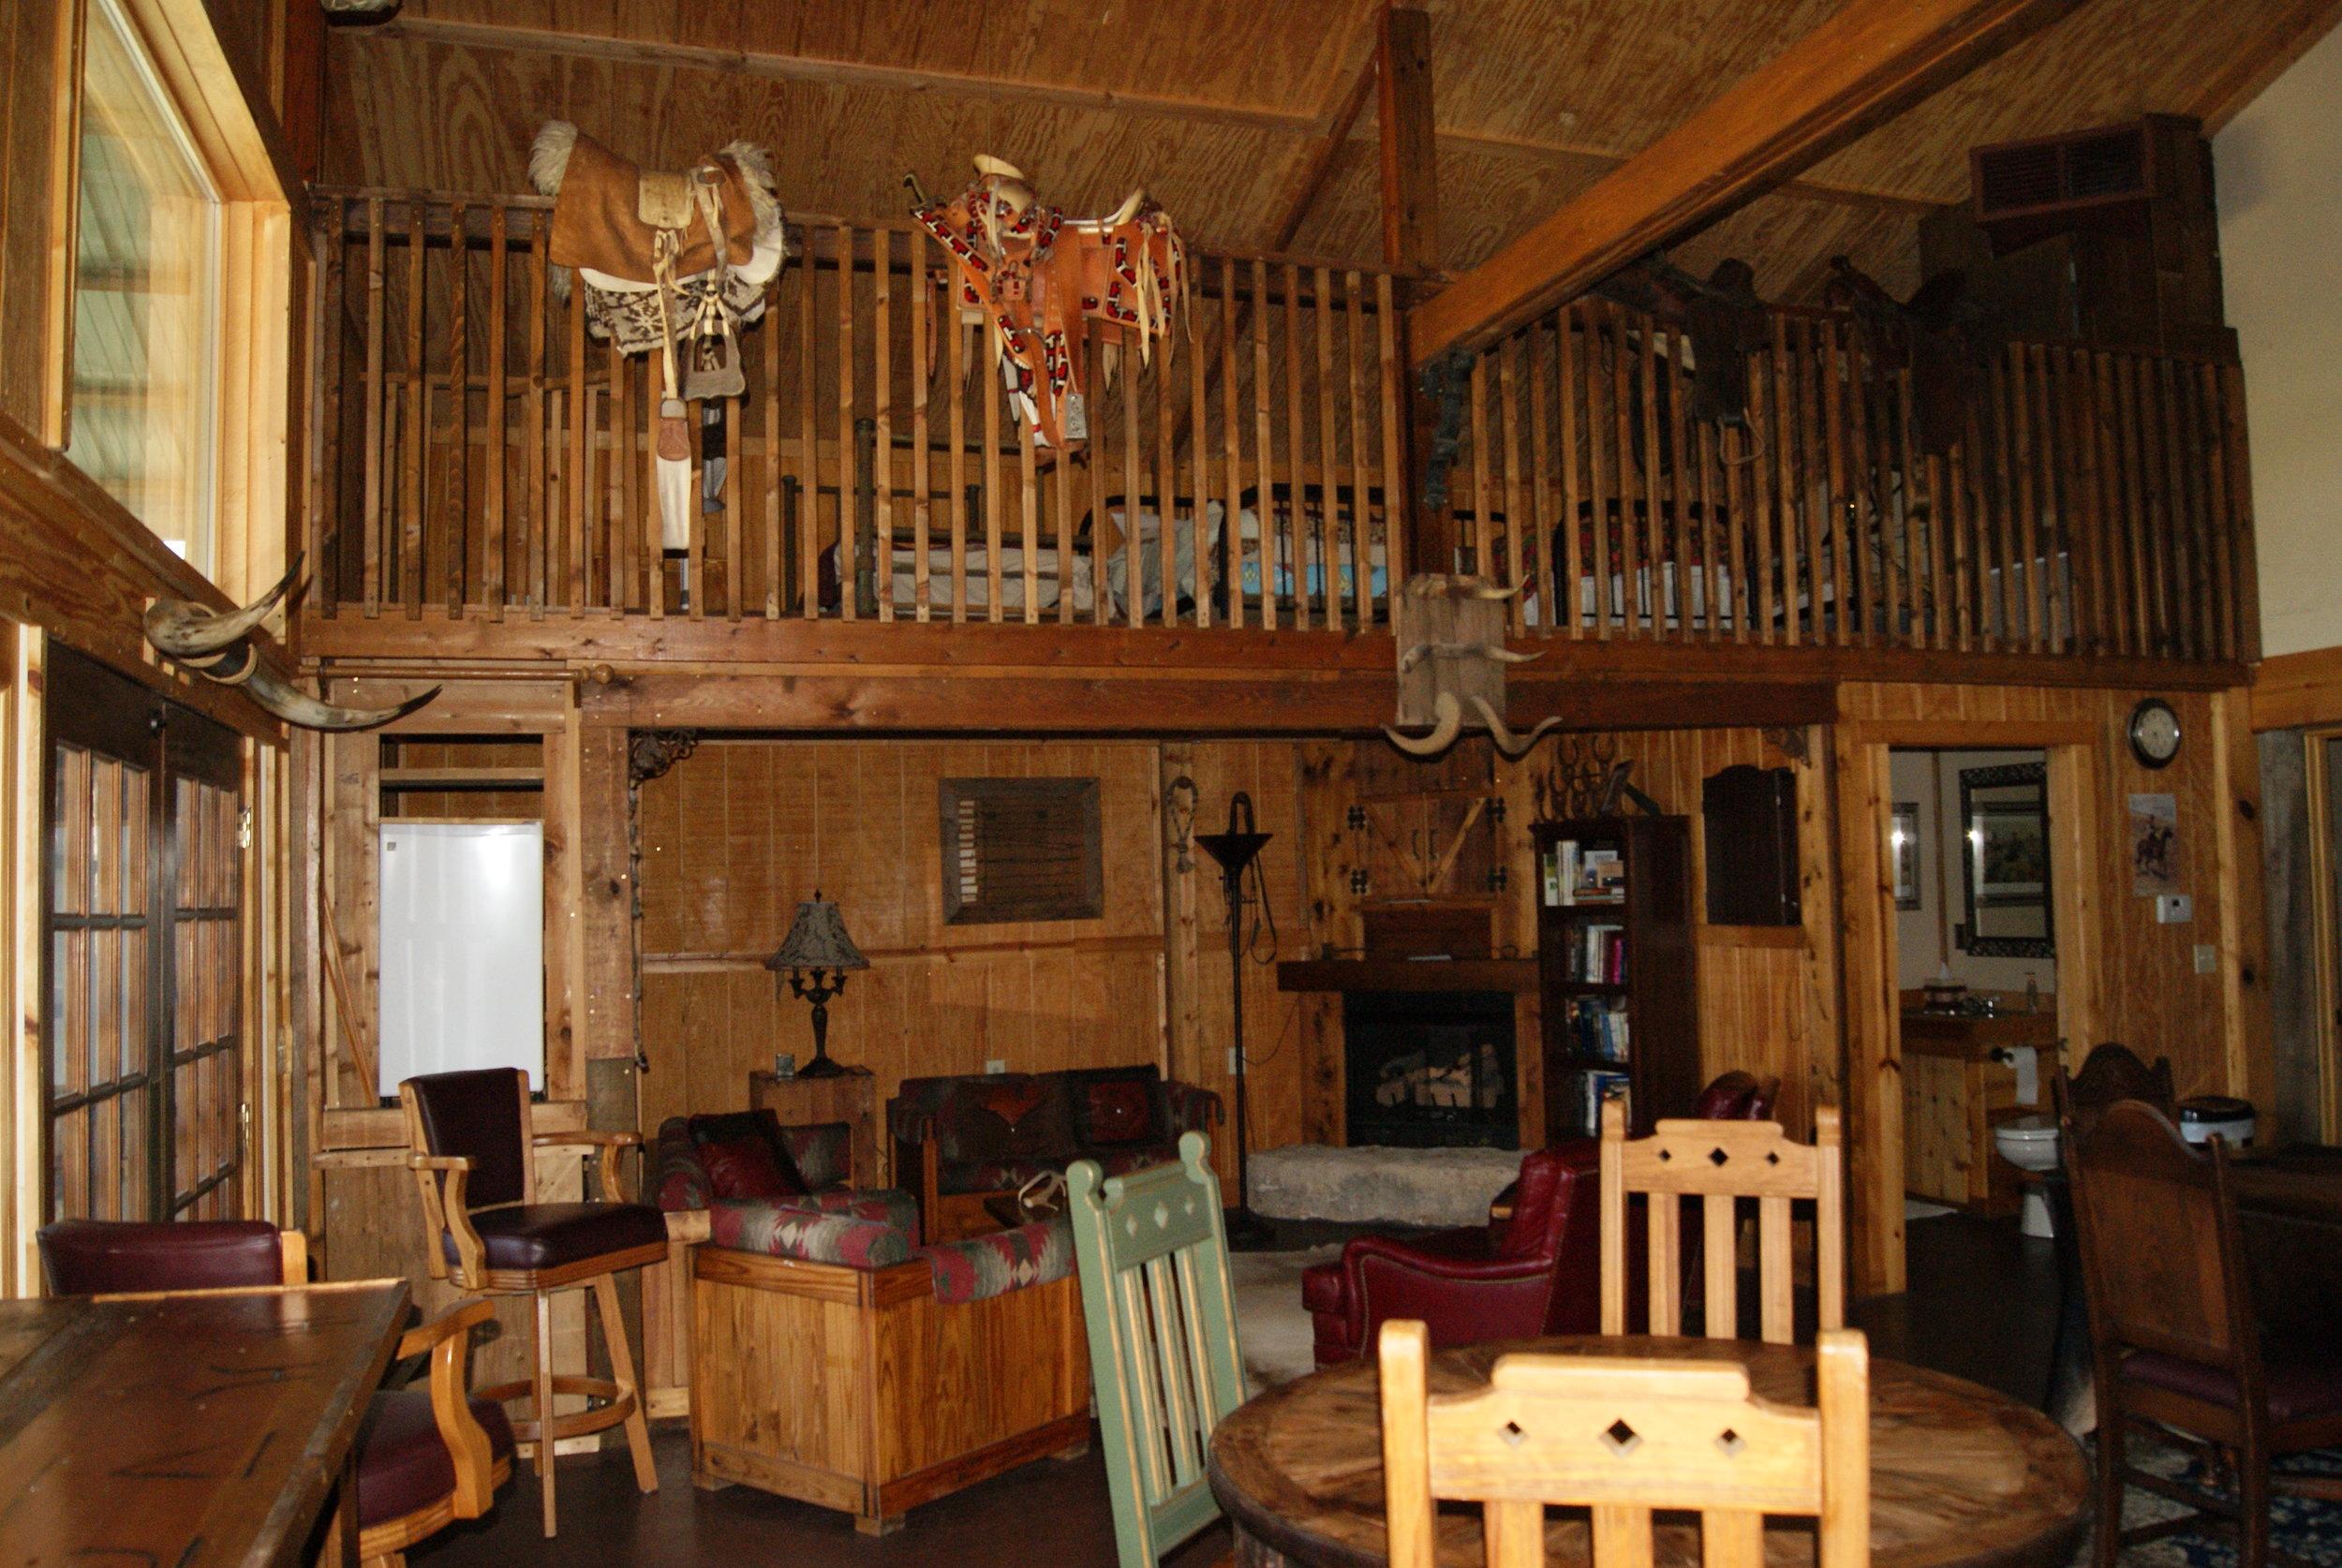 The Lodge East lounge area, loft, and bathroom